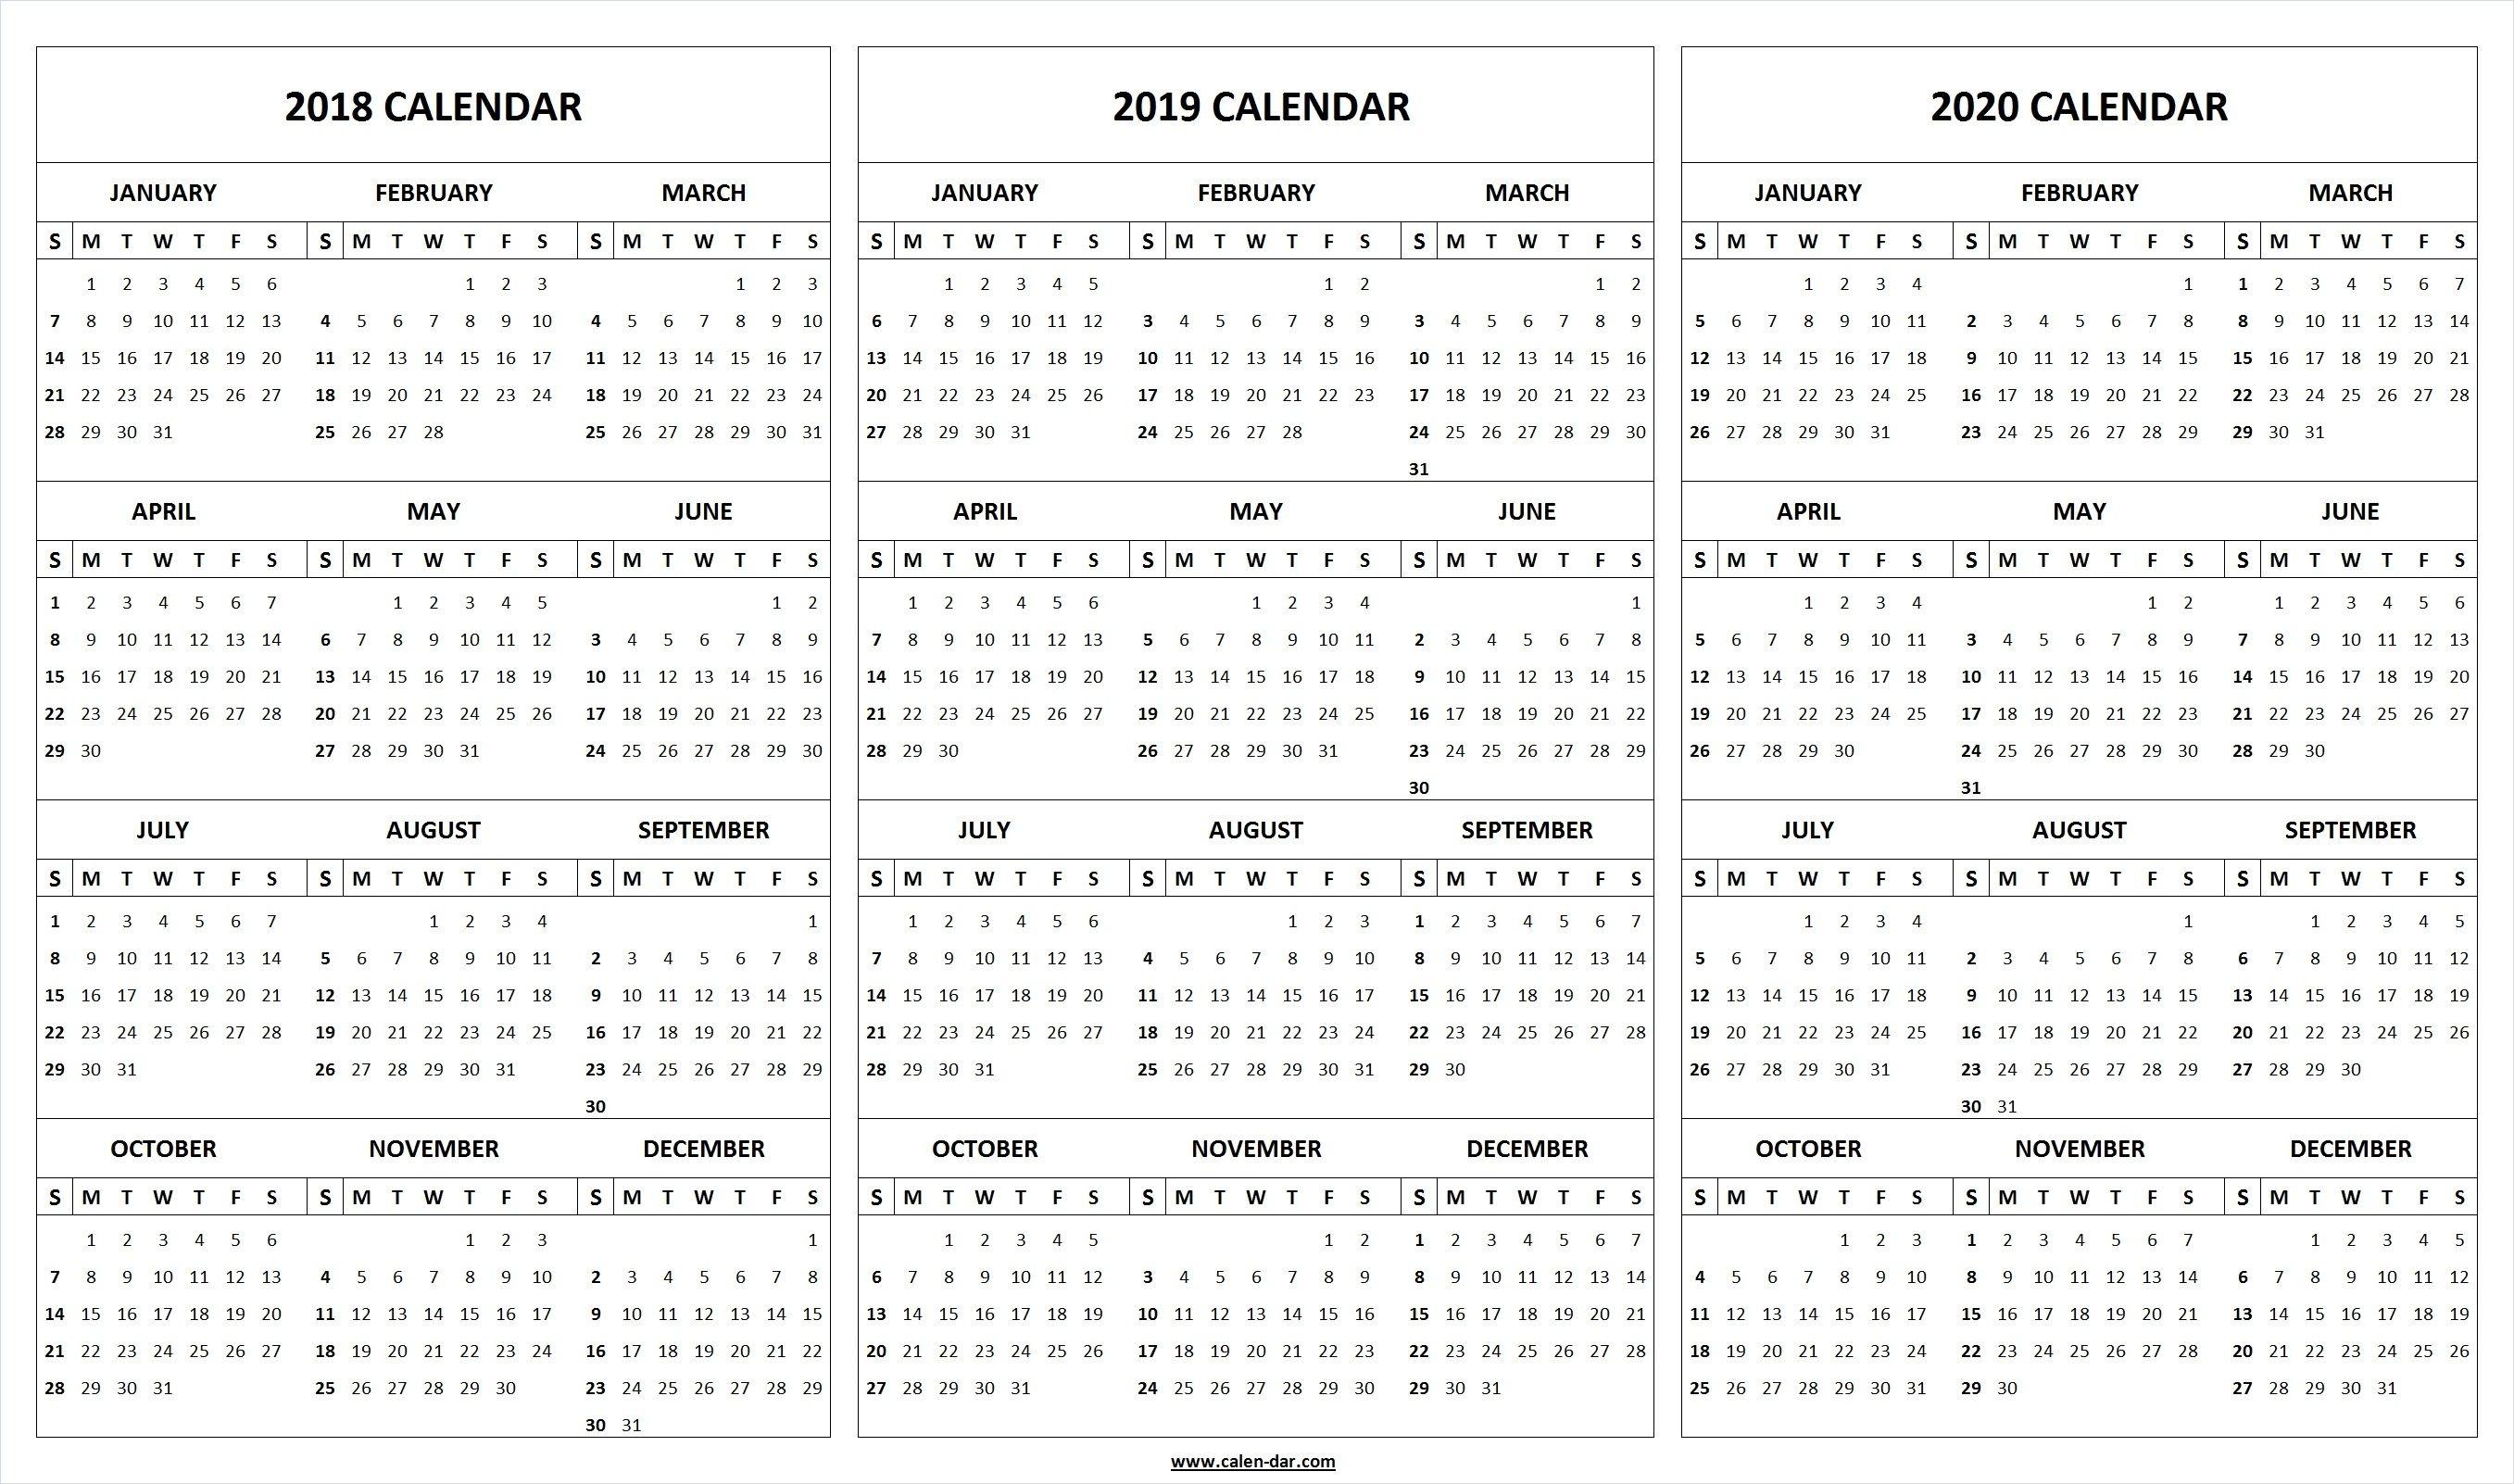 Print Blank 2018 2019 2020 Calendar Template   Organize!   Printable pertaining to Printable Fill In Calendar 2019 - 2020